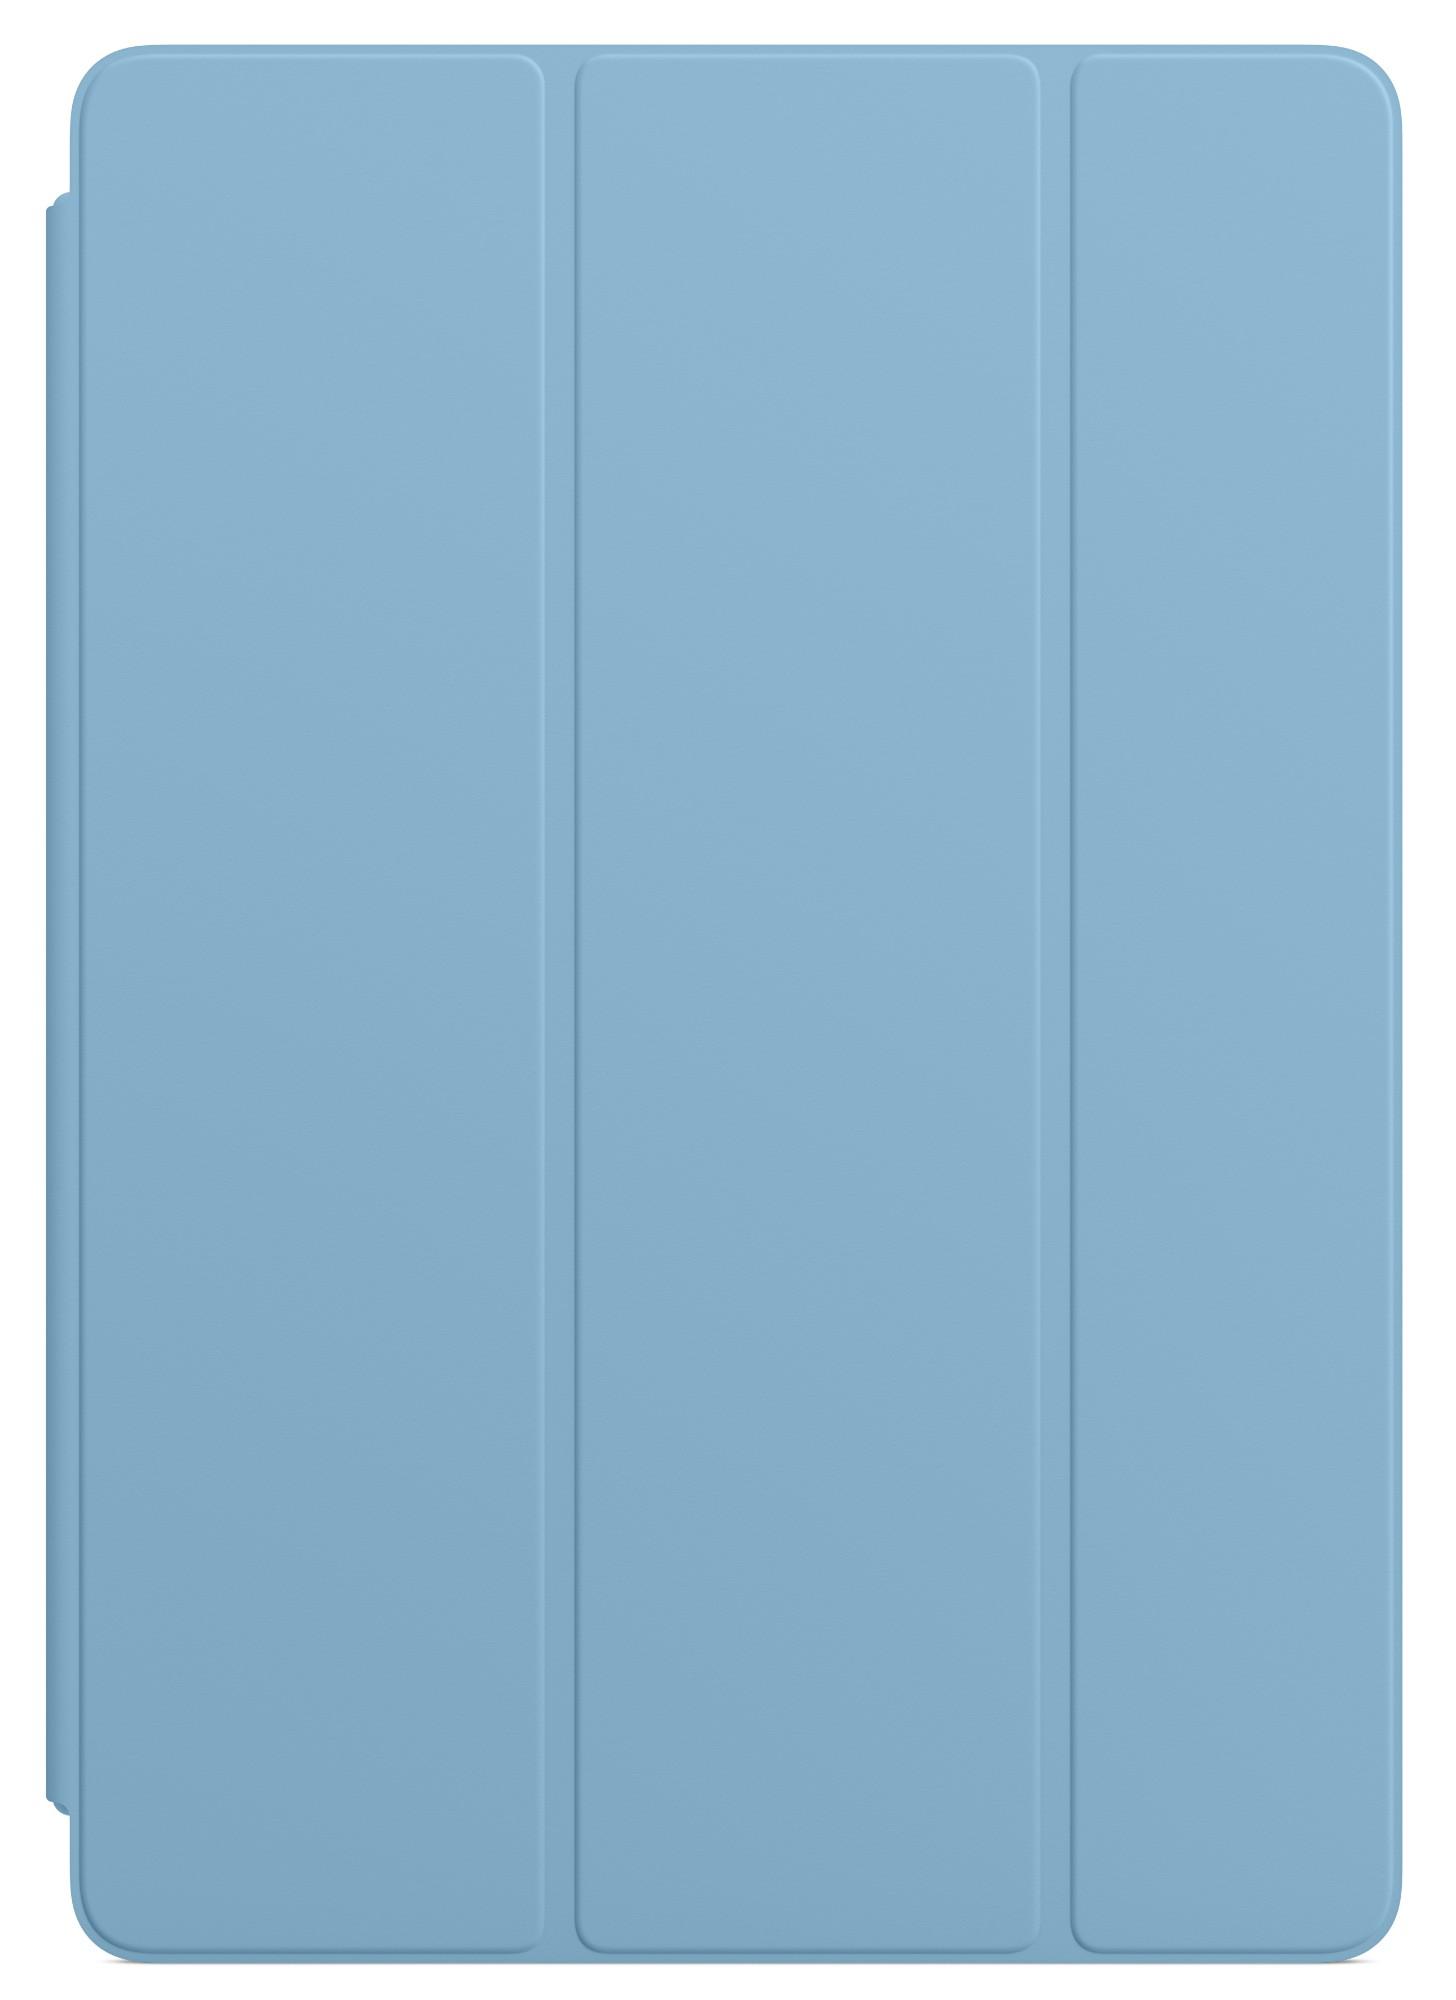 Smart Cover 10.5in iPad Air - Cornflower